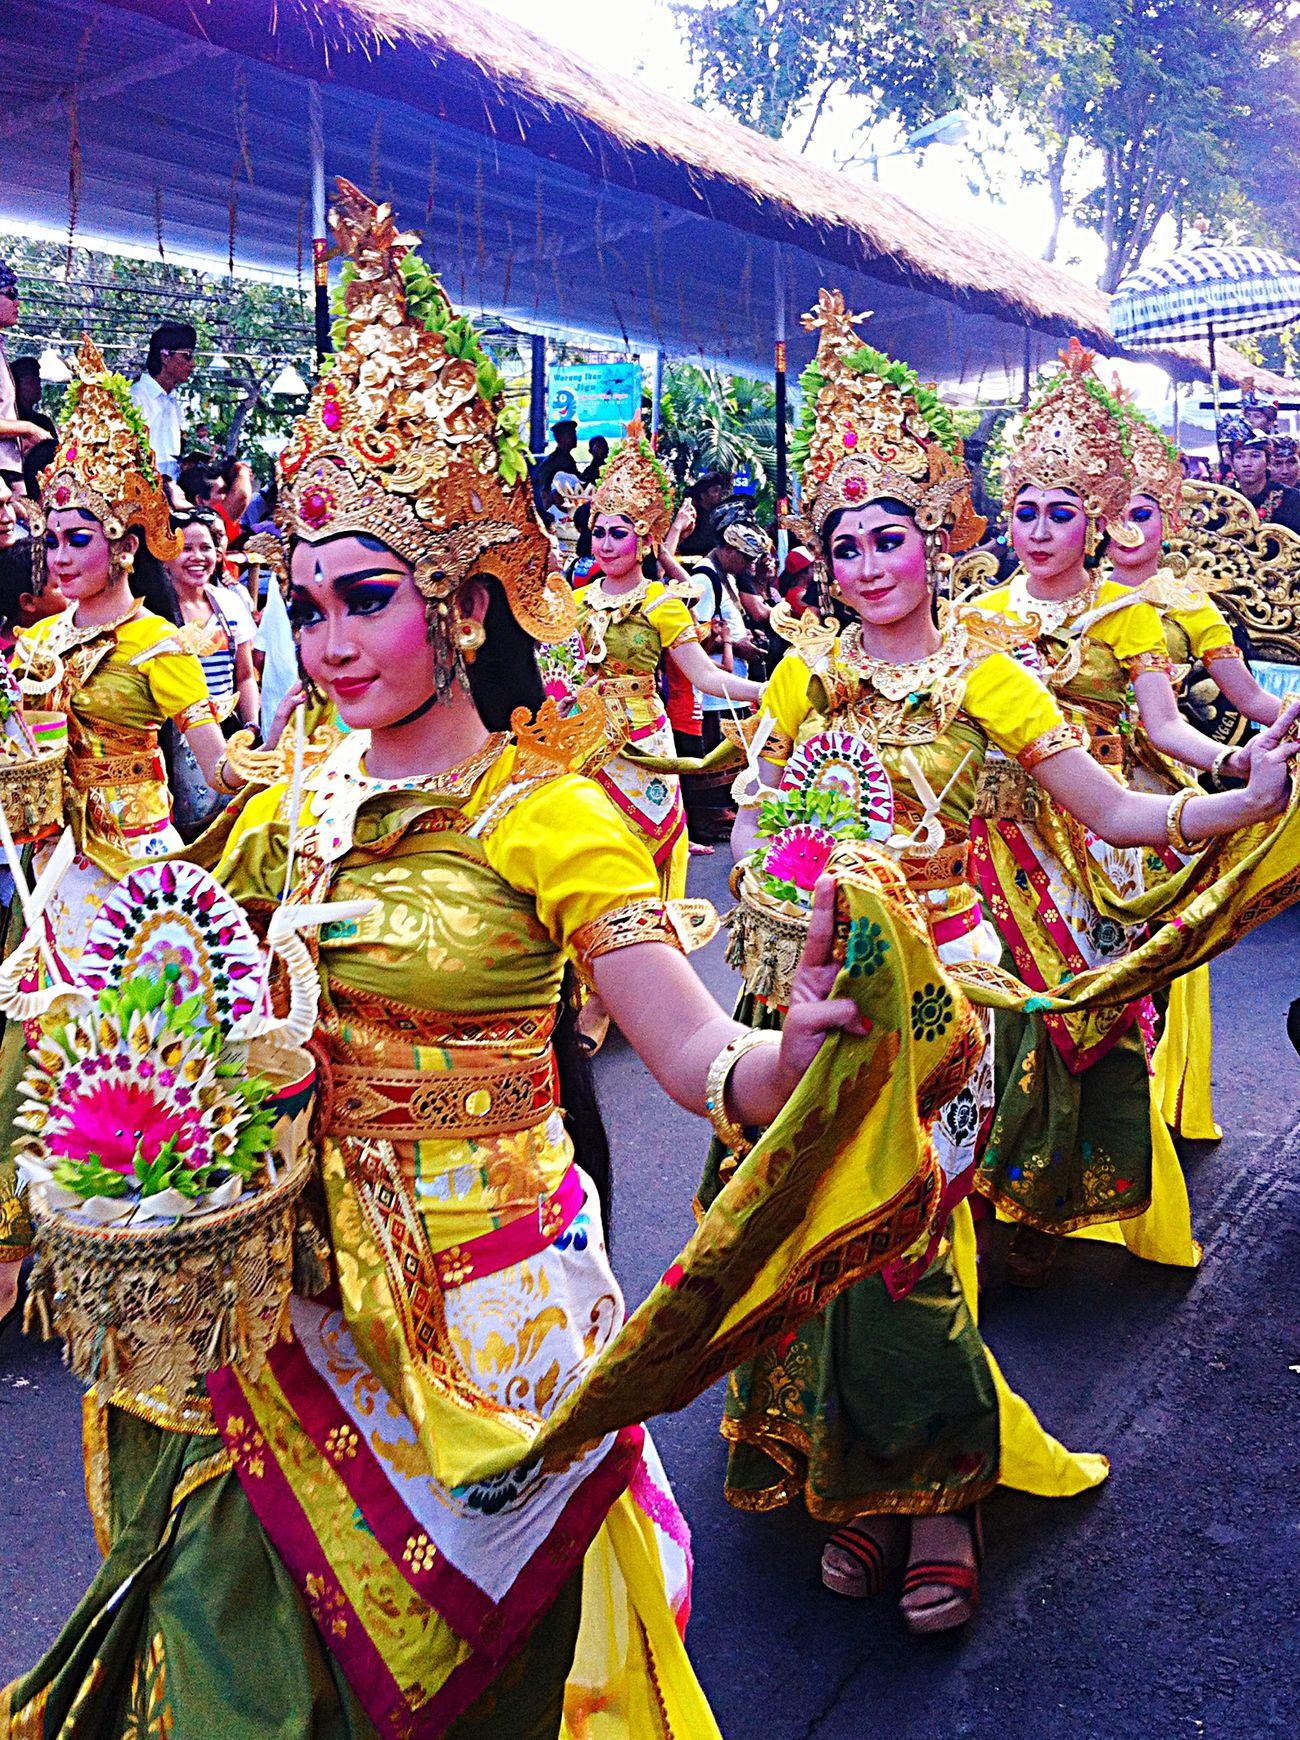 Dance Balinesedance Parade Baliartfestival Angles Carnival